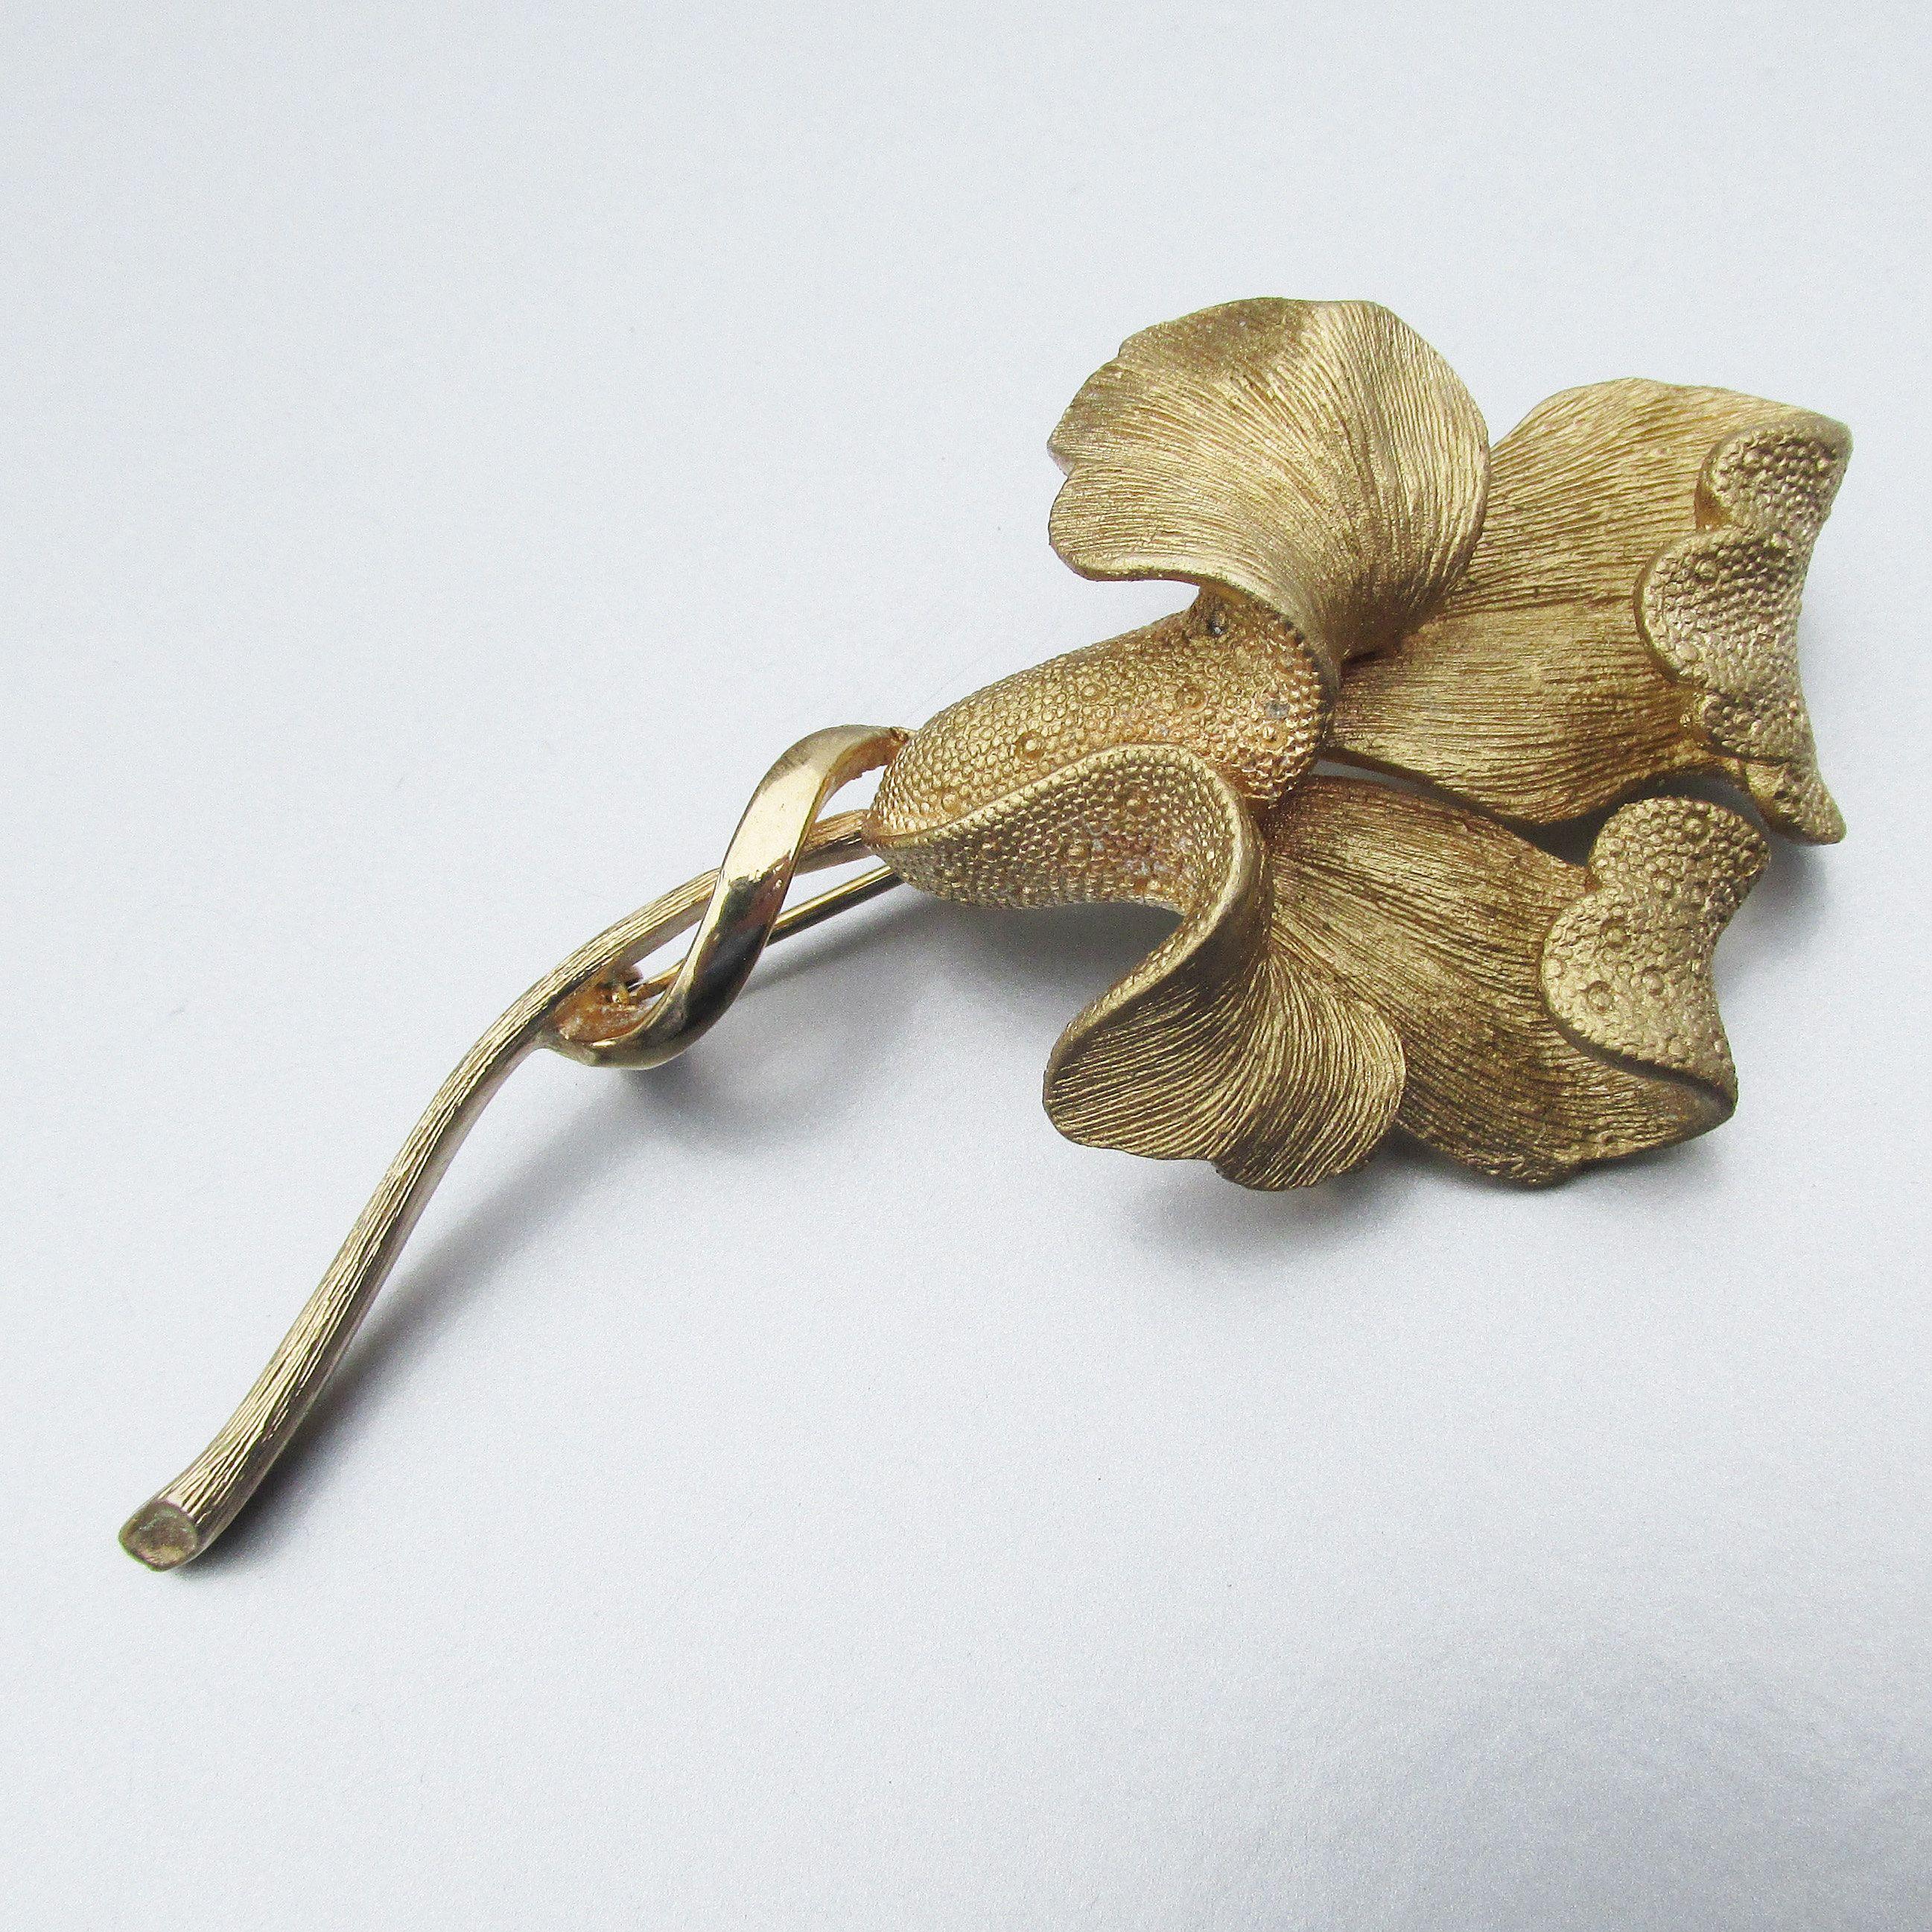 Coro Flower Brooch Coro Brooch Pin Gifts Coro Jewelry Signed Coro Jewelry Vintage Coro Pin Coro Pin Vintage Coro Brooch Vintage Coro